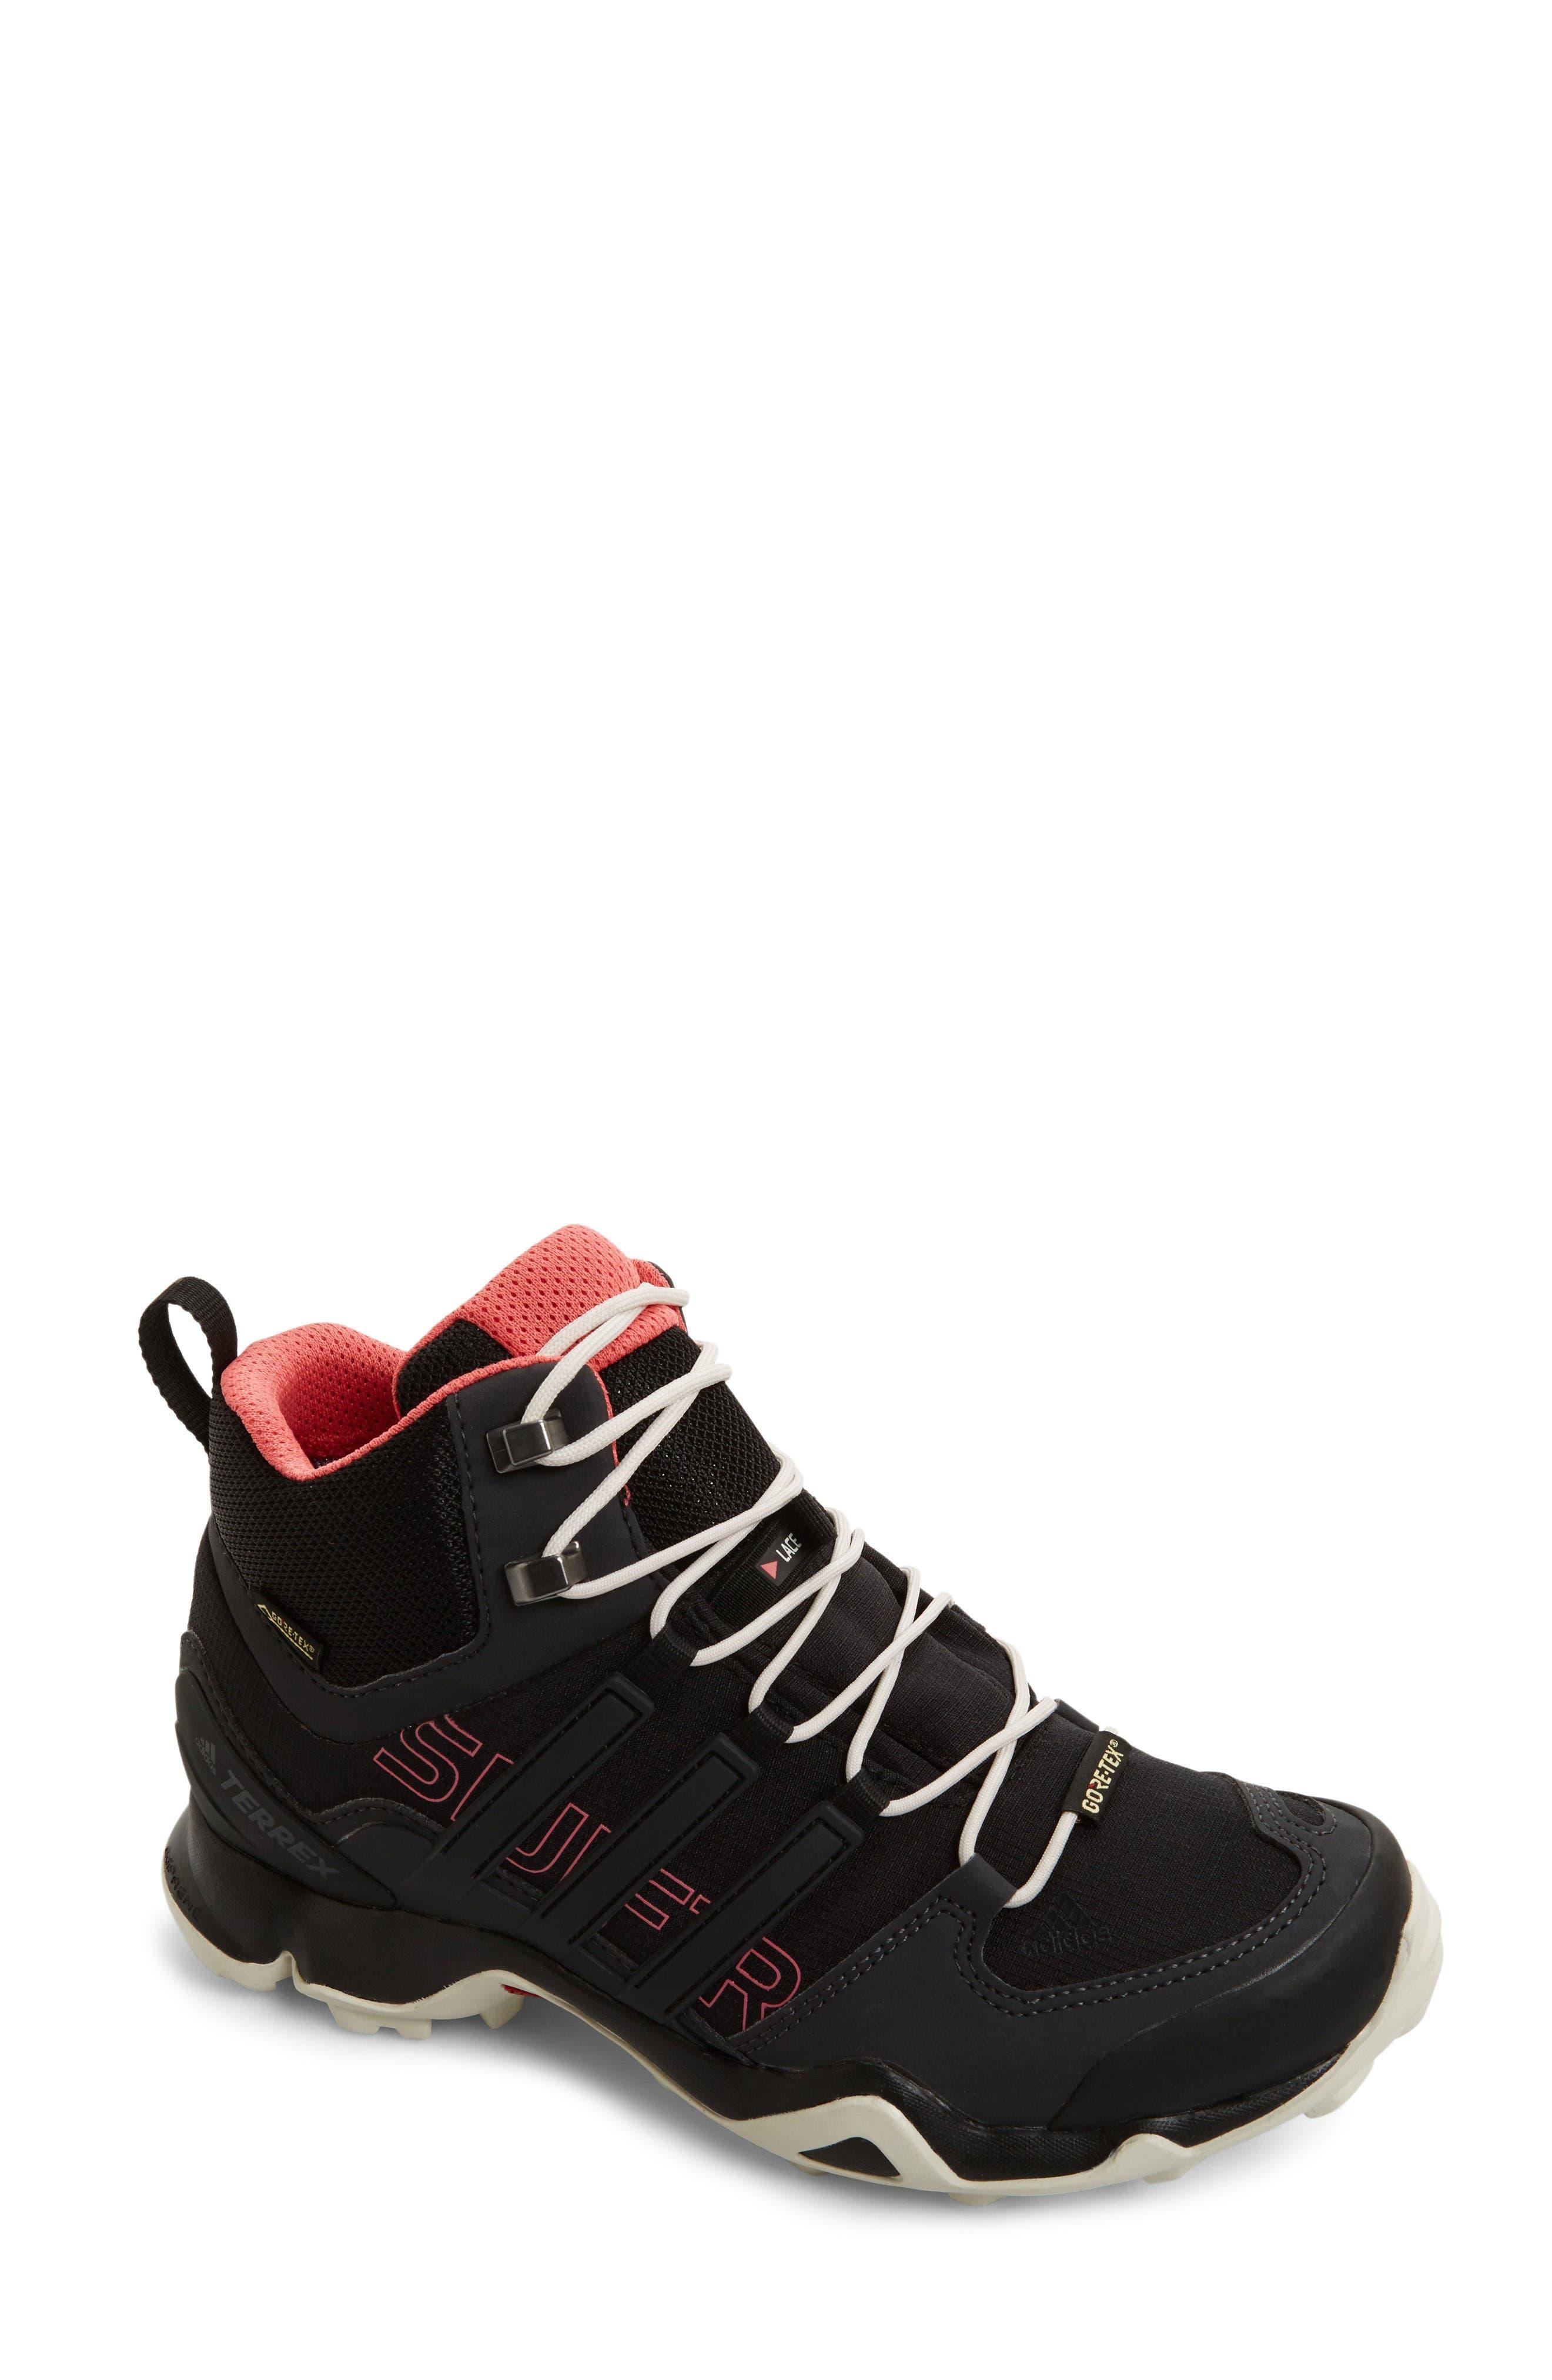 Main Image - adidas Terrex Swift R GTX Mid Hiking Boot (Women)